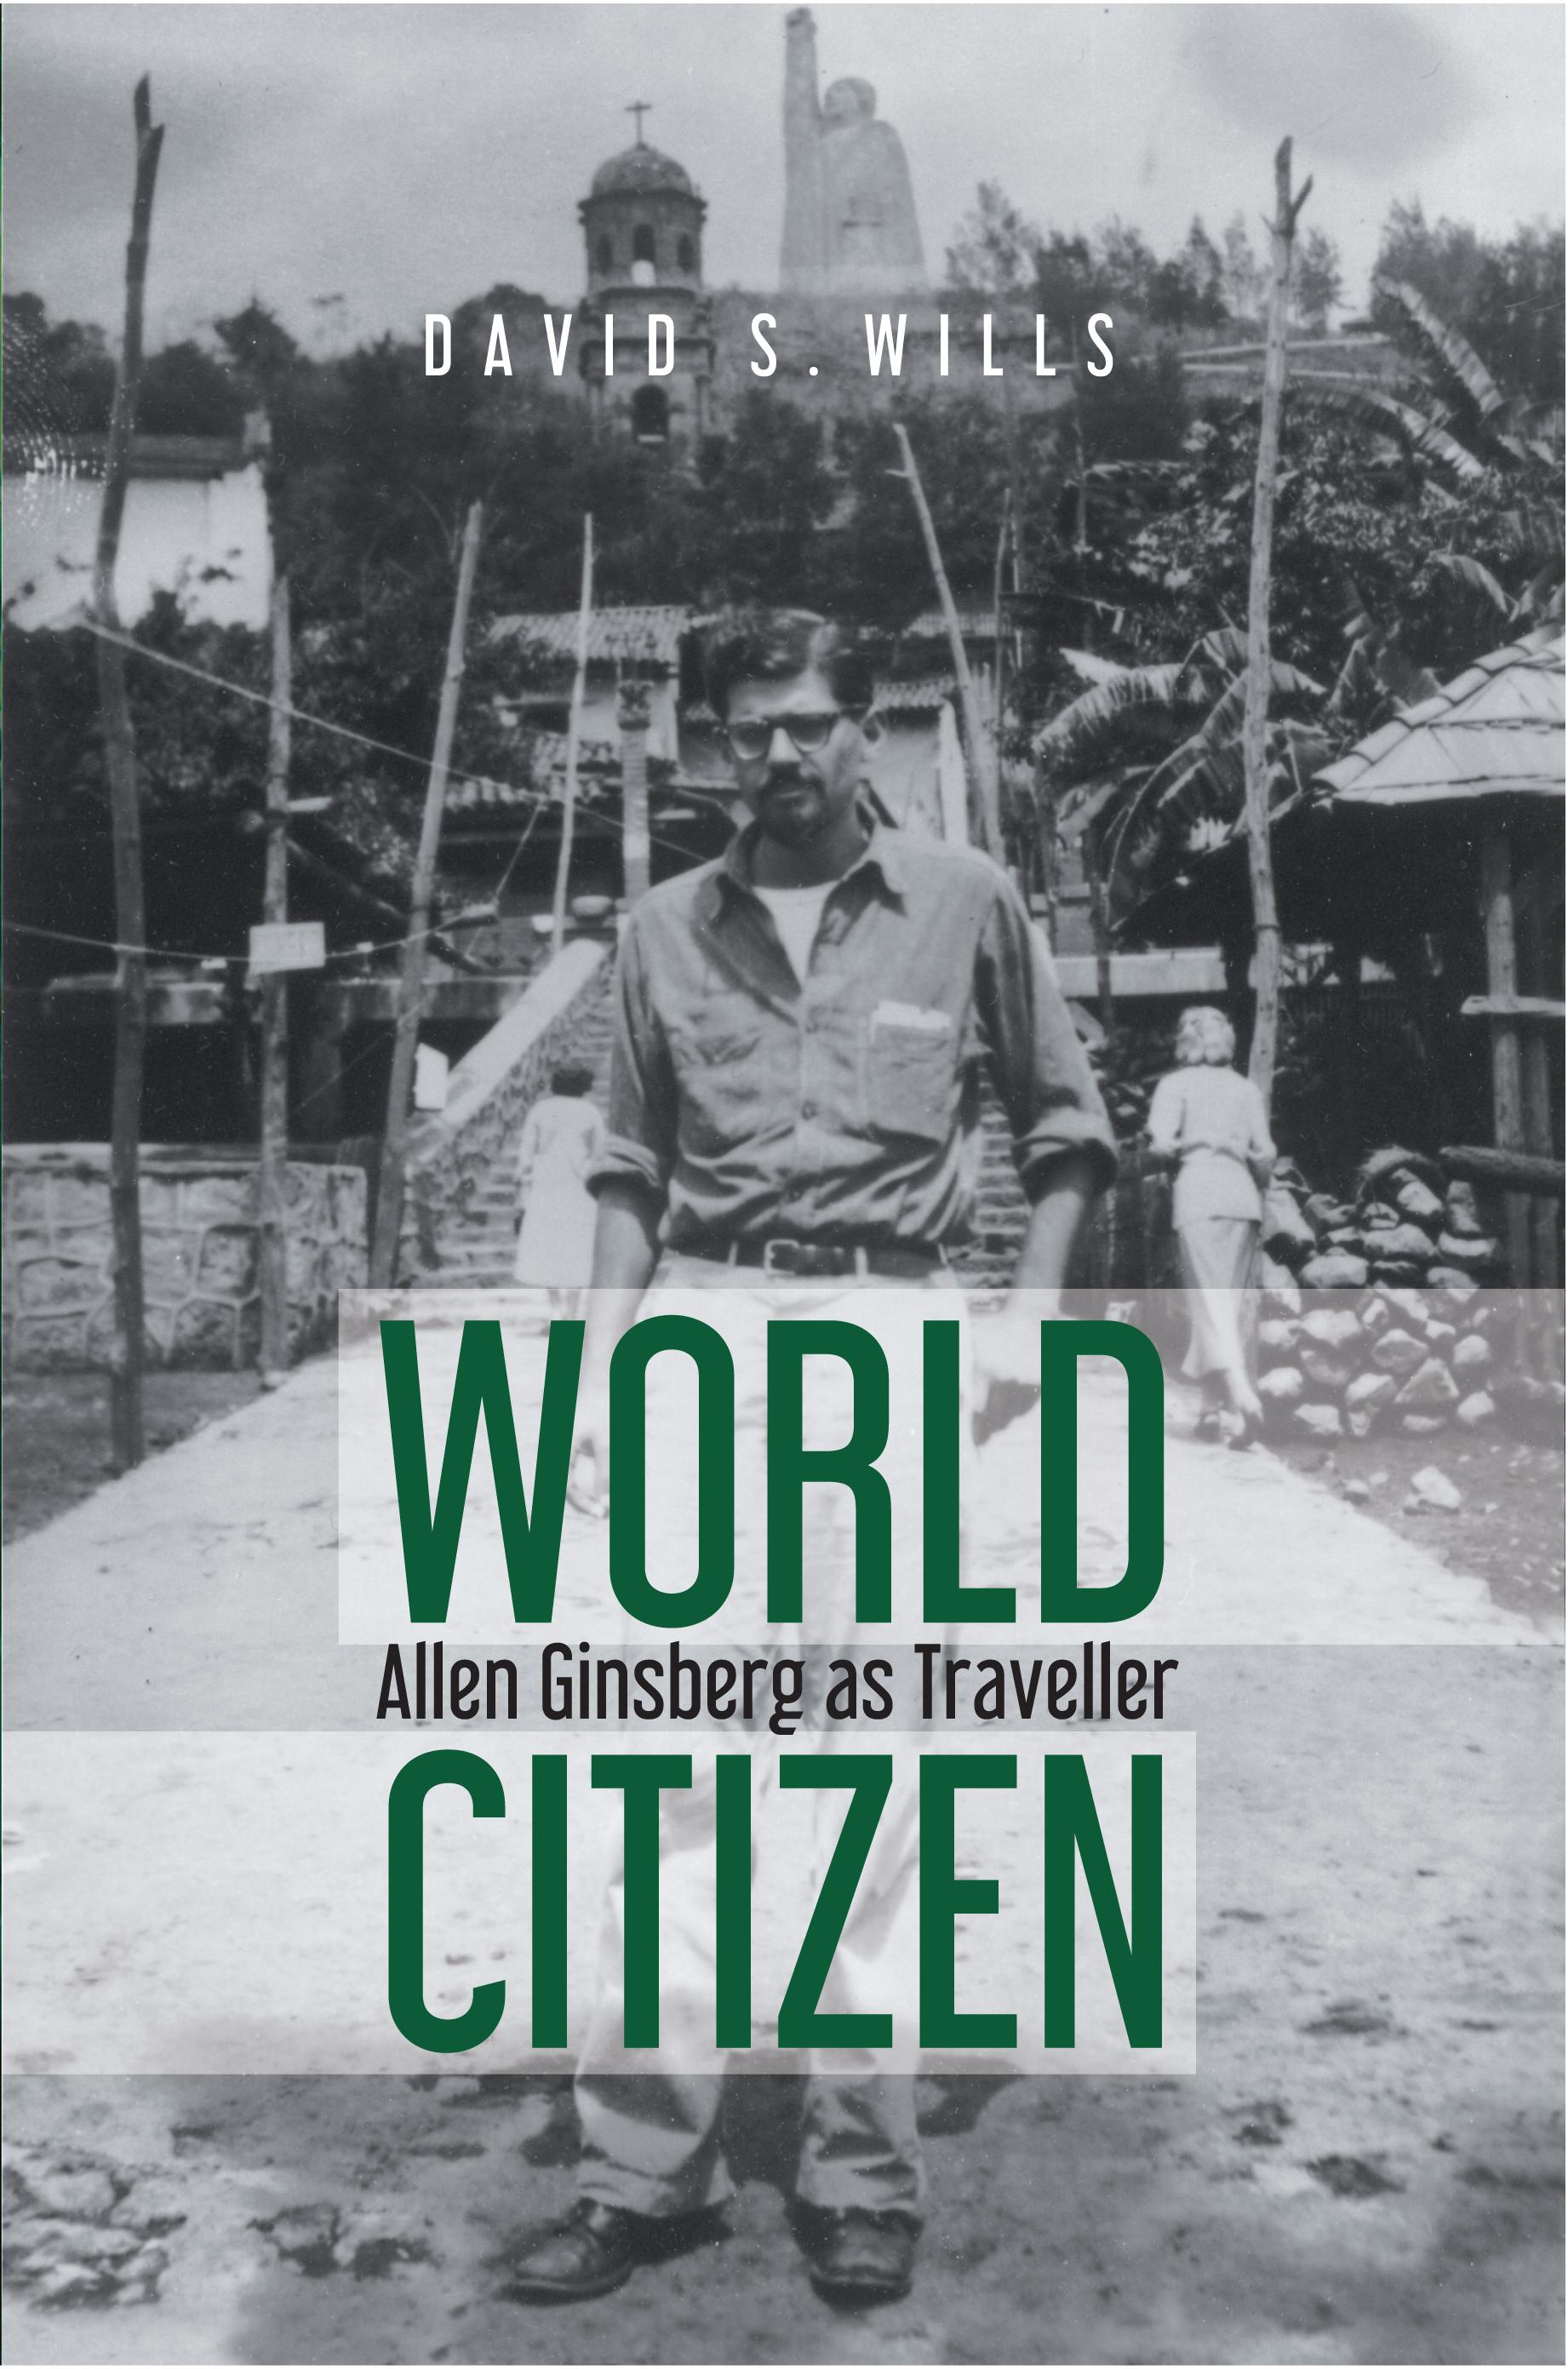 Pre-Order World Citizen